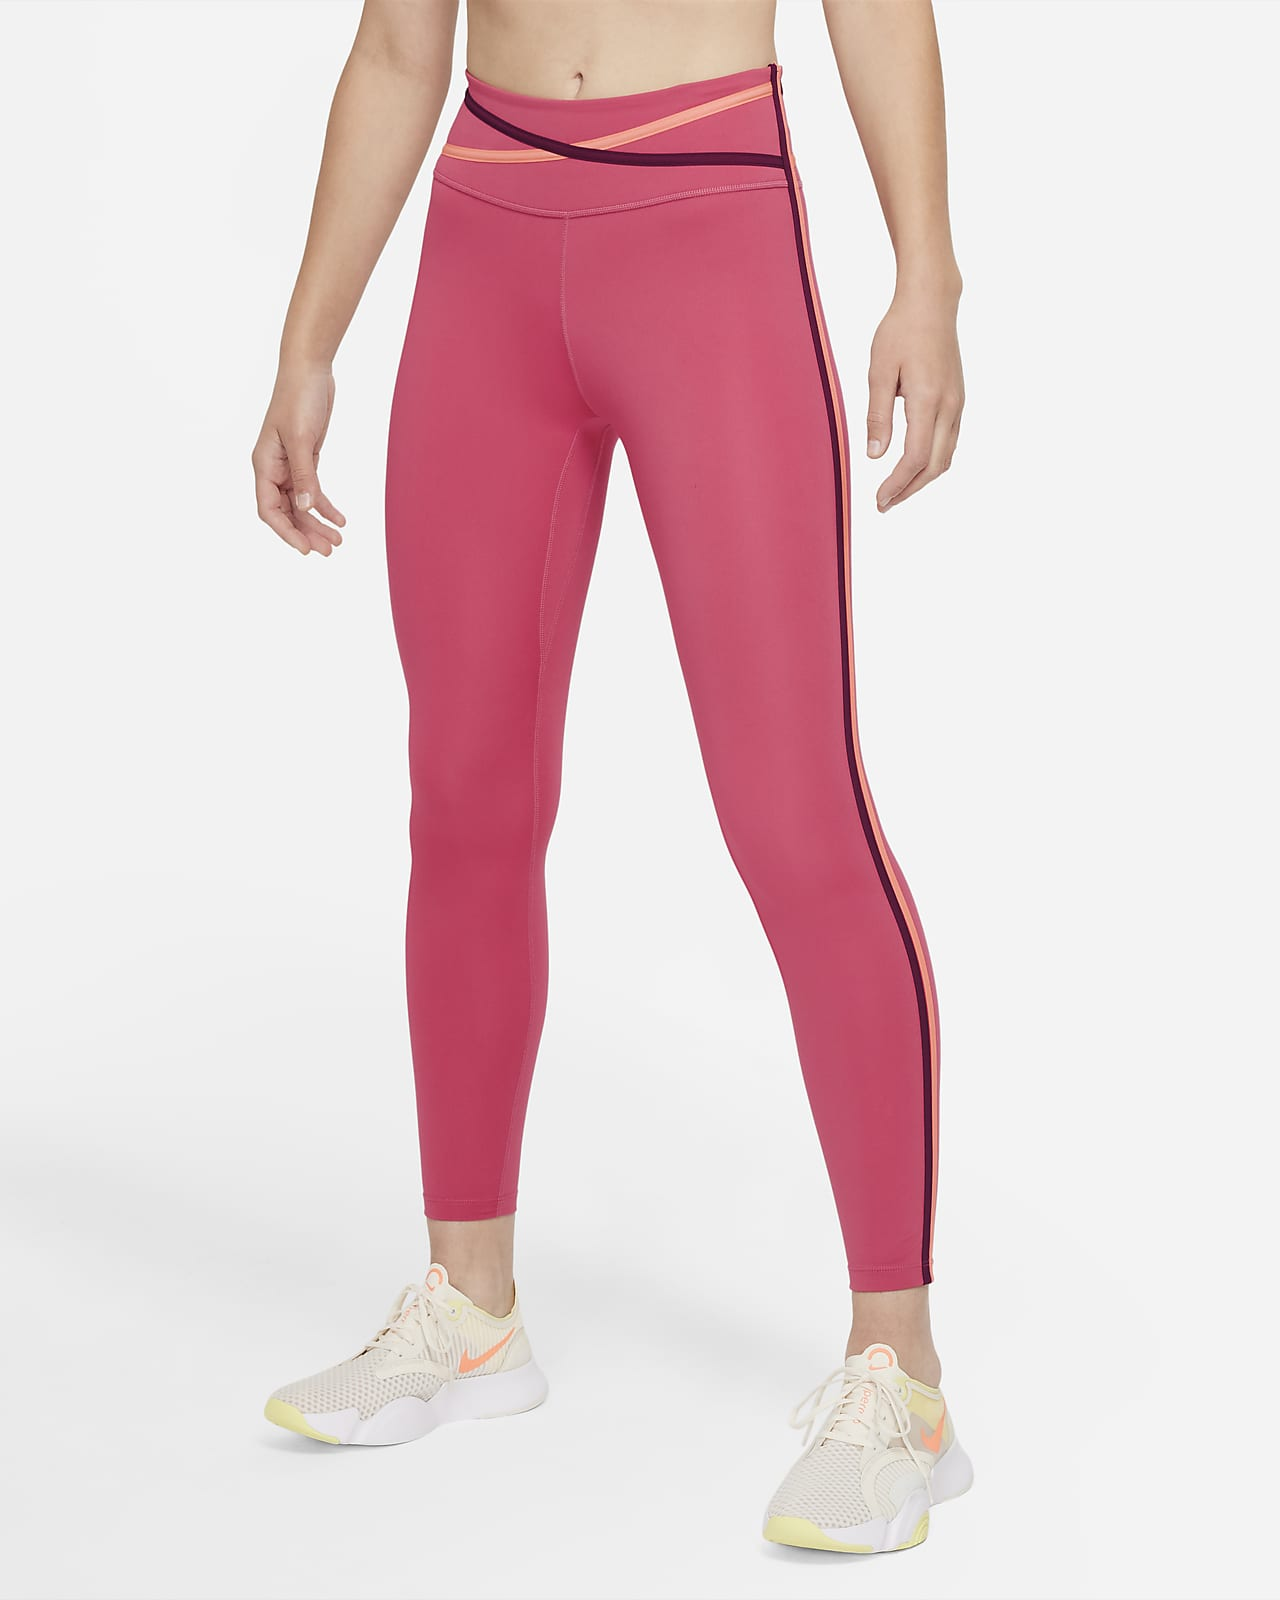 Legging 7/8 taille mi-basse Nike Dri-FIT One pour Femme